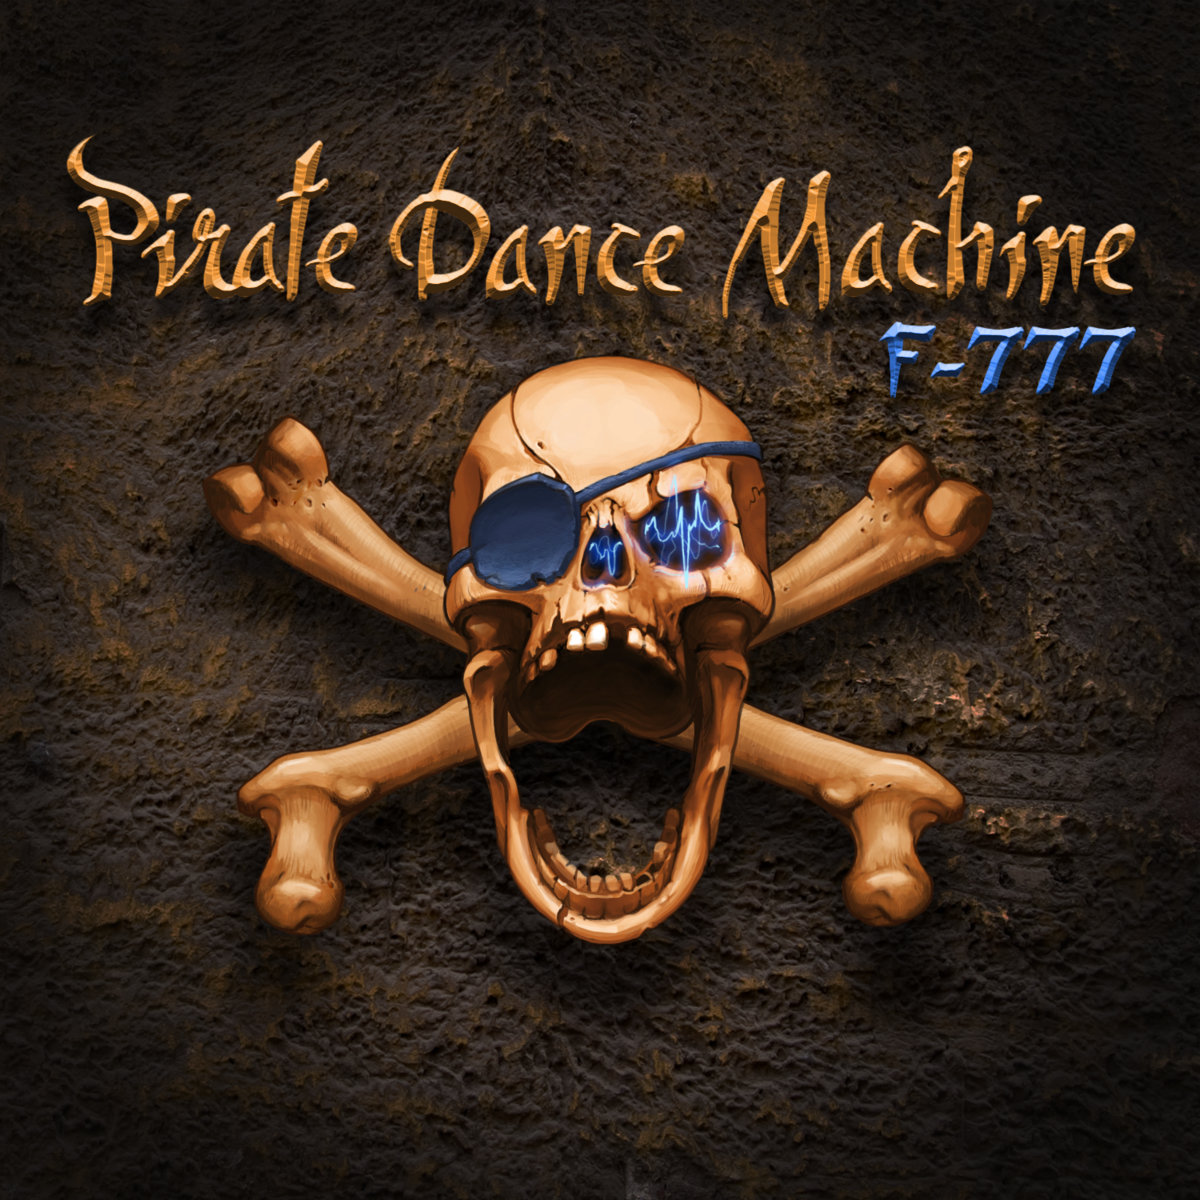 f 777 the seven seas free download